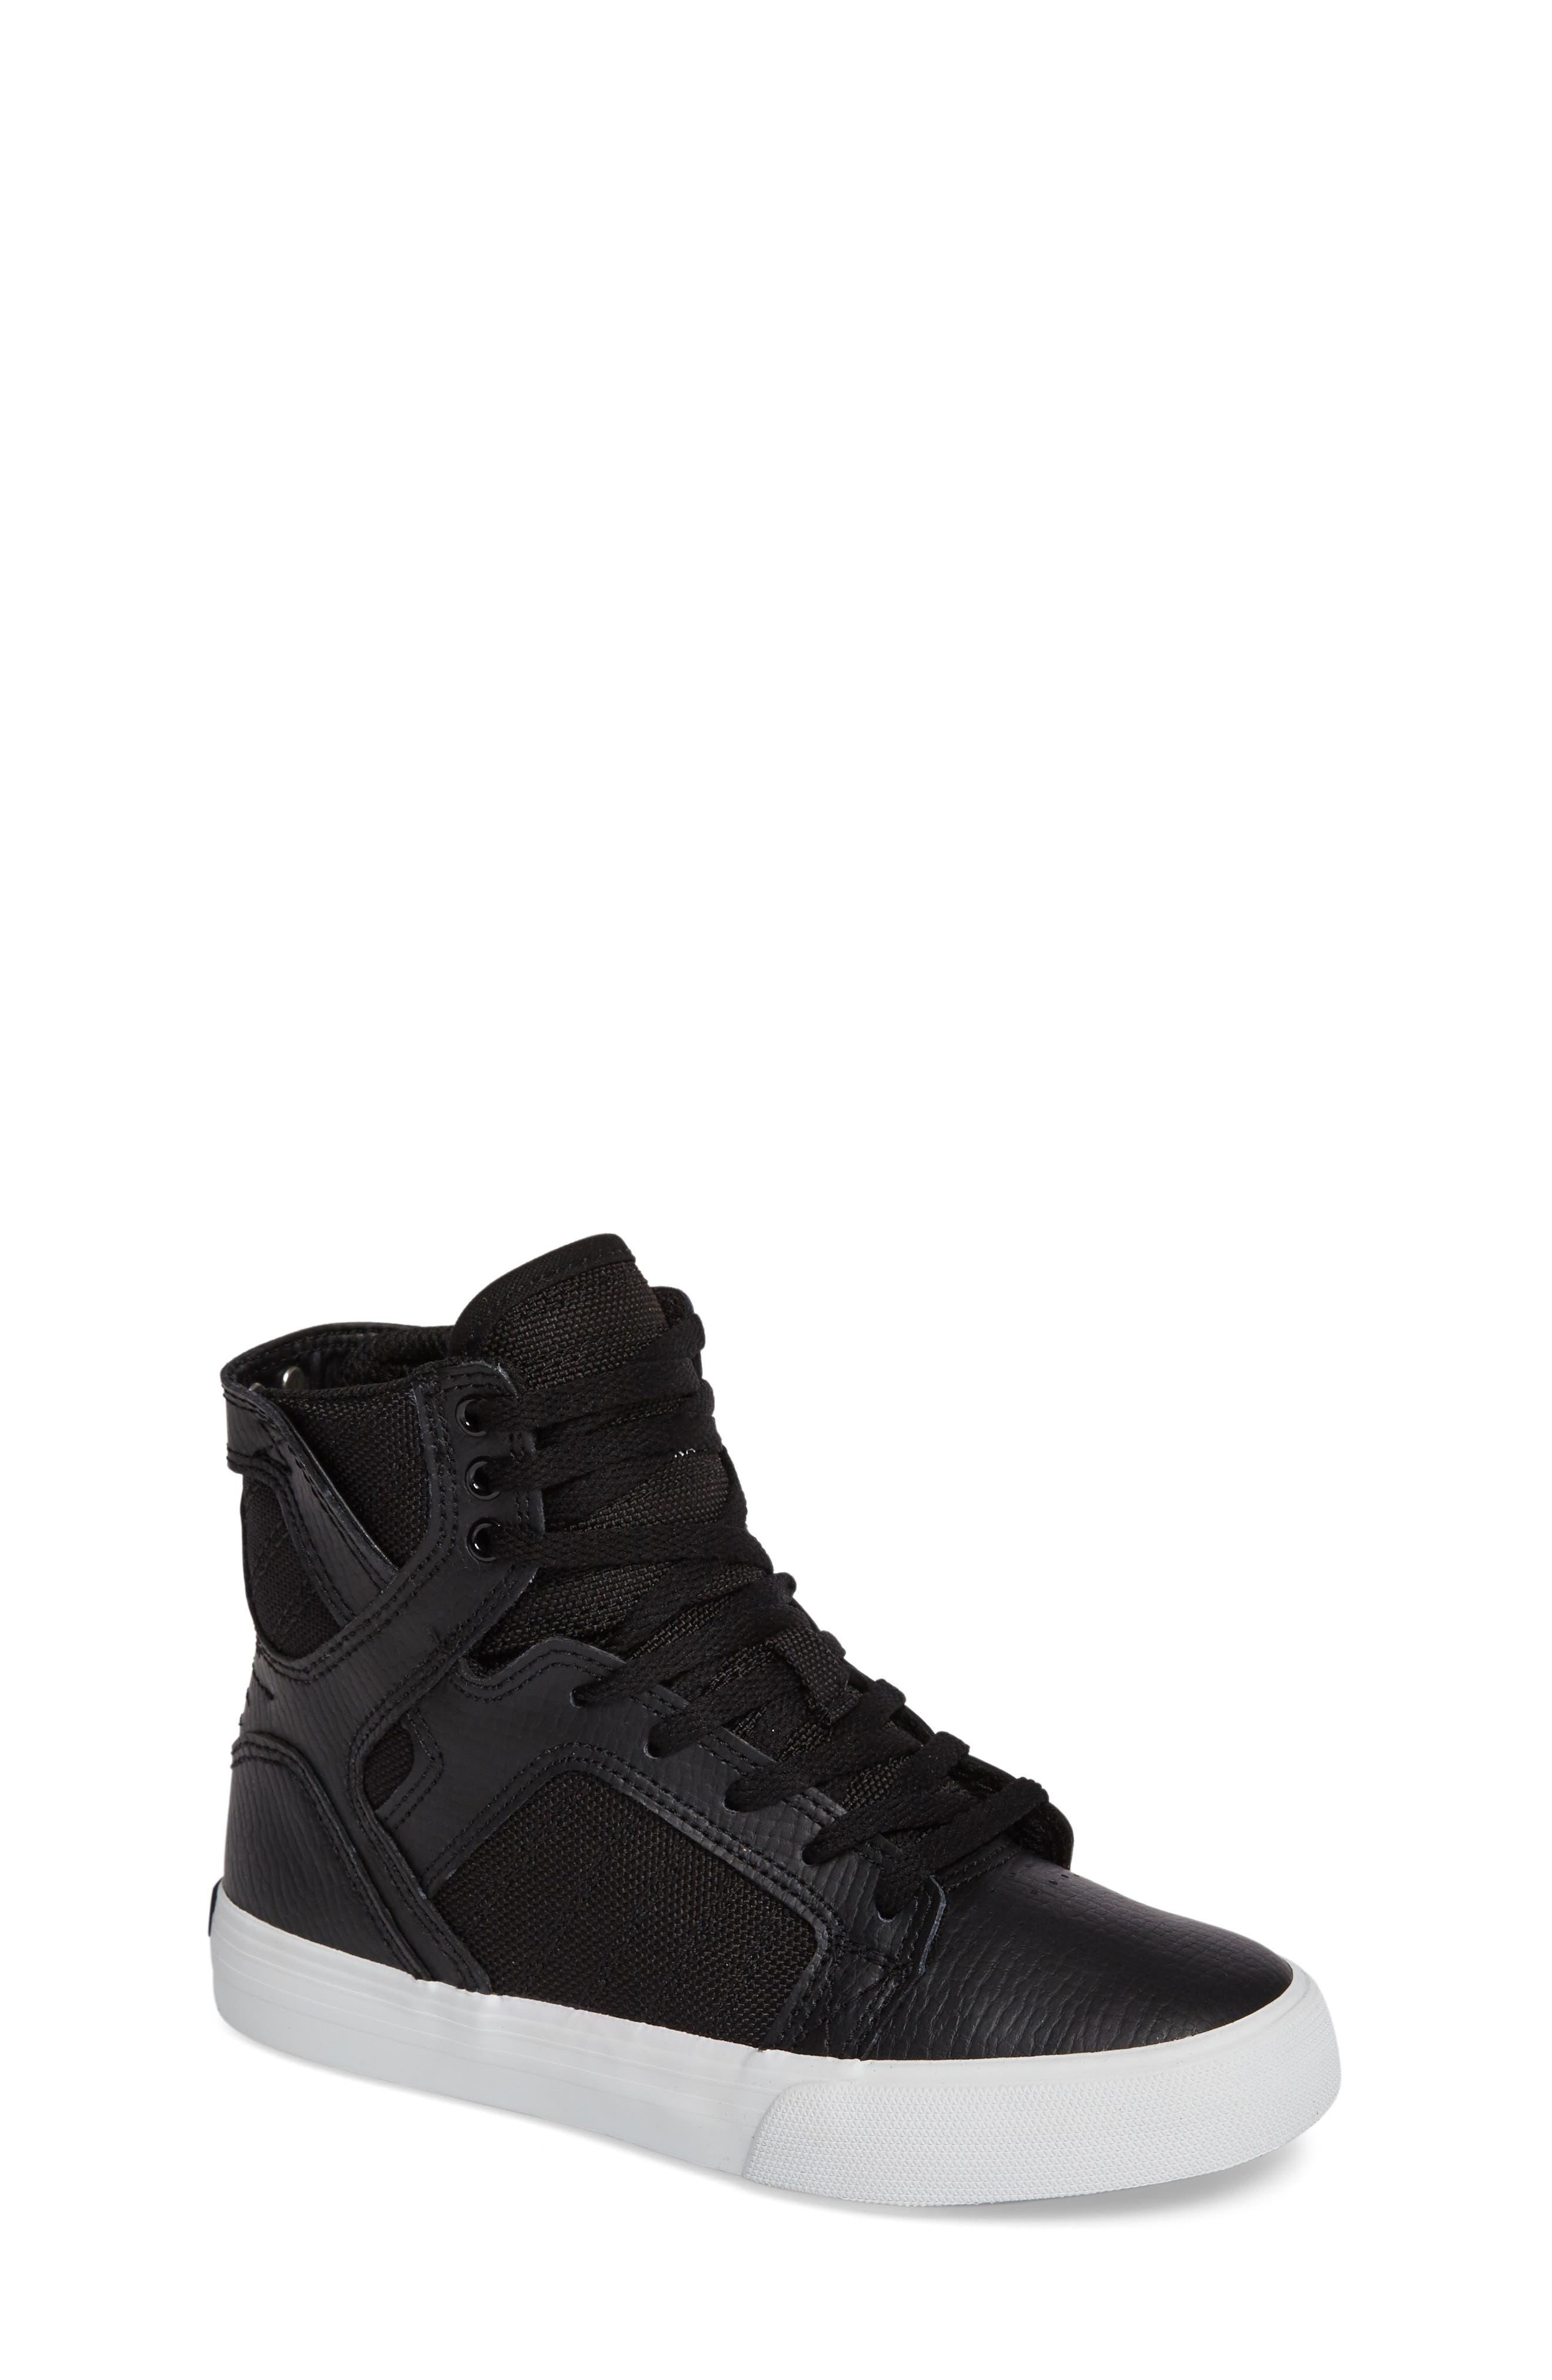 'Skytop' High Top Sneaker,                         Main,                         color, Black/ White